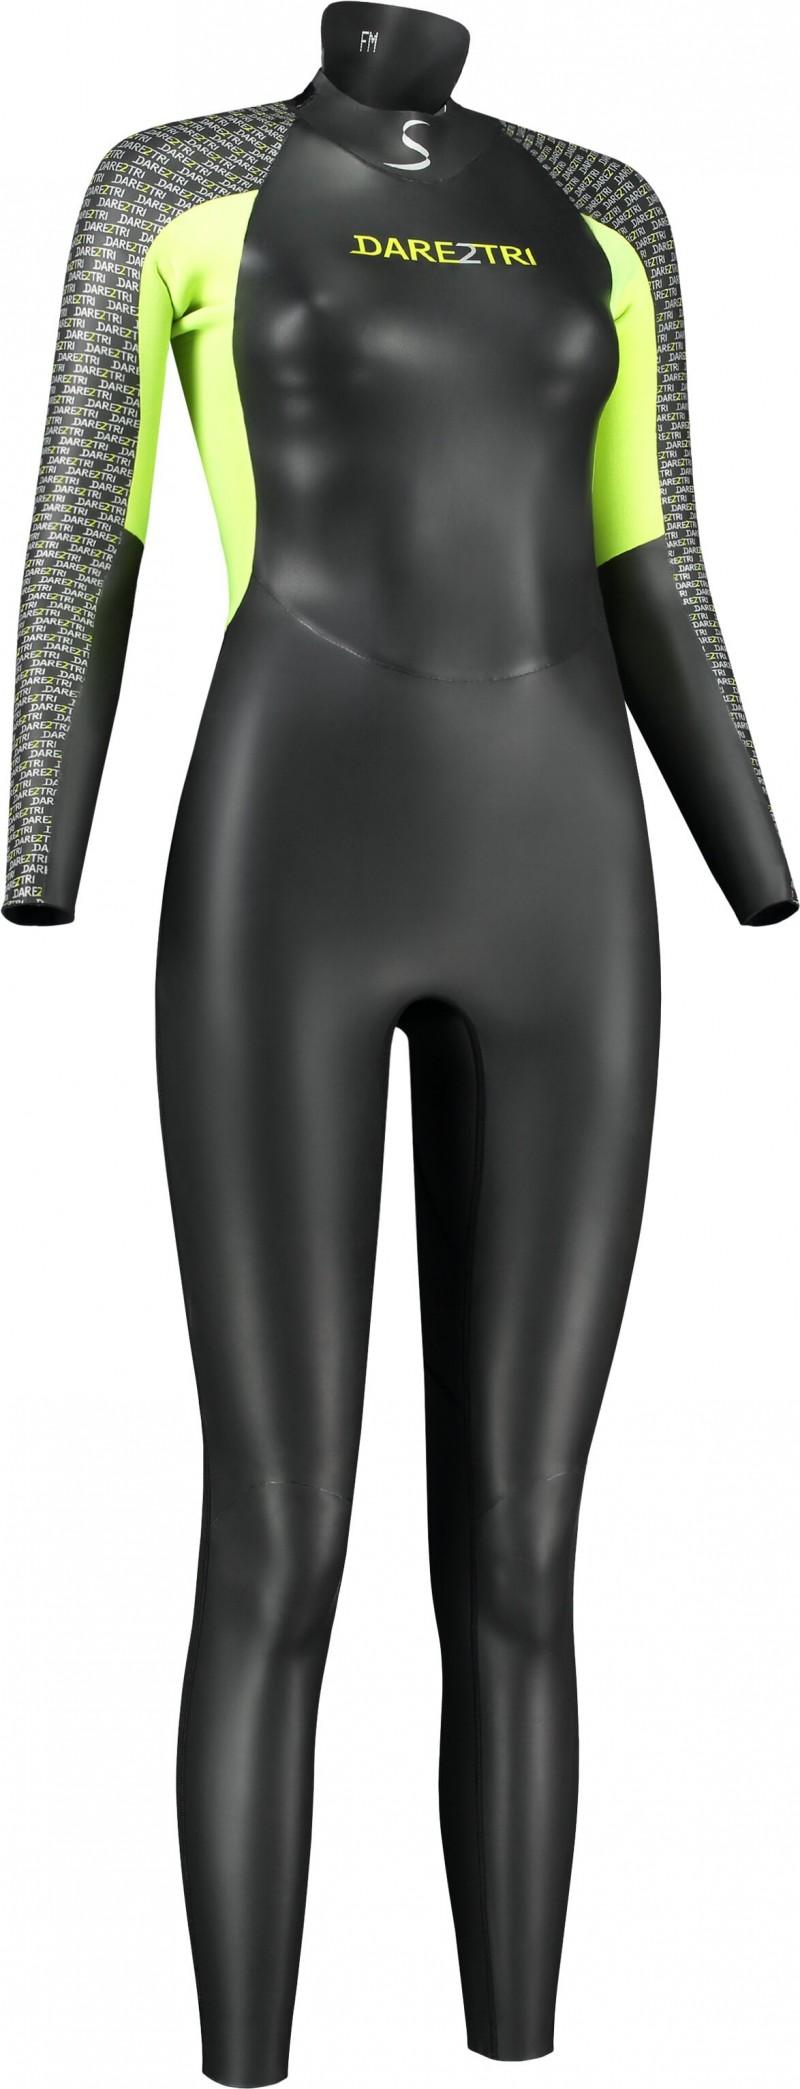 Dare2Tri - To Swim Wetsuit (Size: FL)